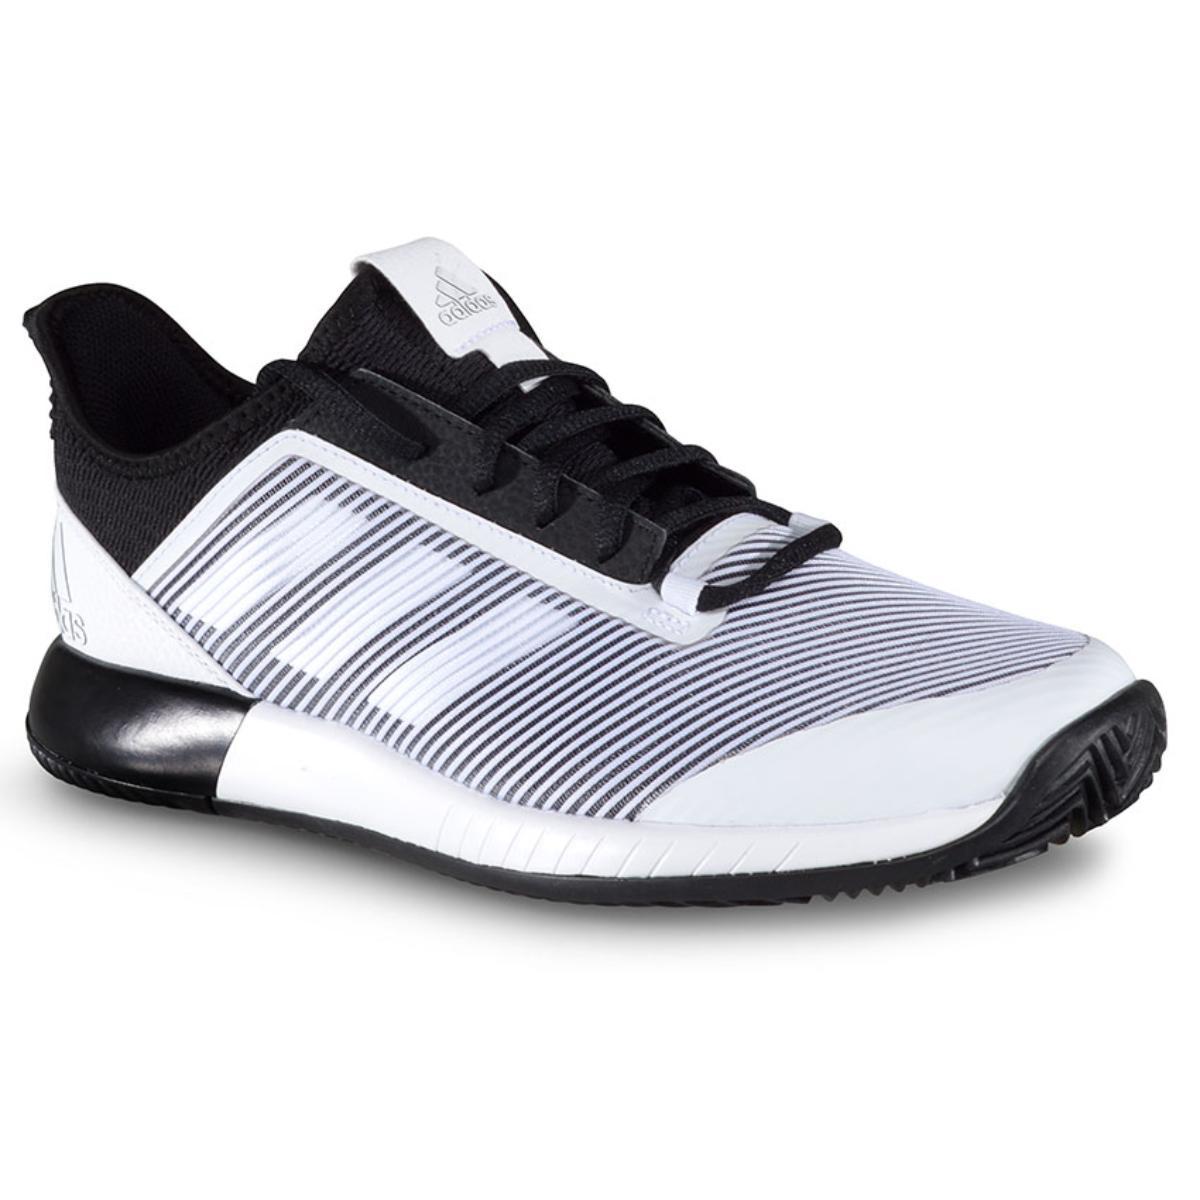 Tênis Masculino Adidas Eh0948 Defiant Bounce 2 m Branco/preto